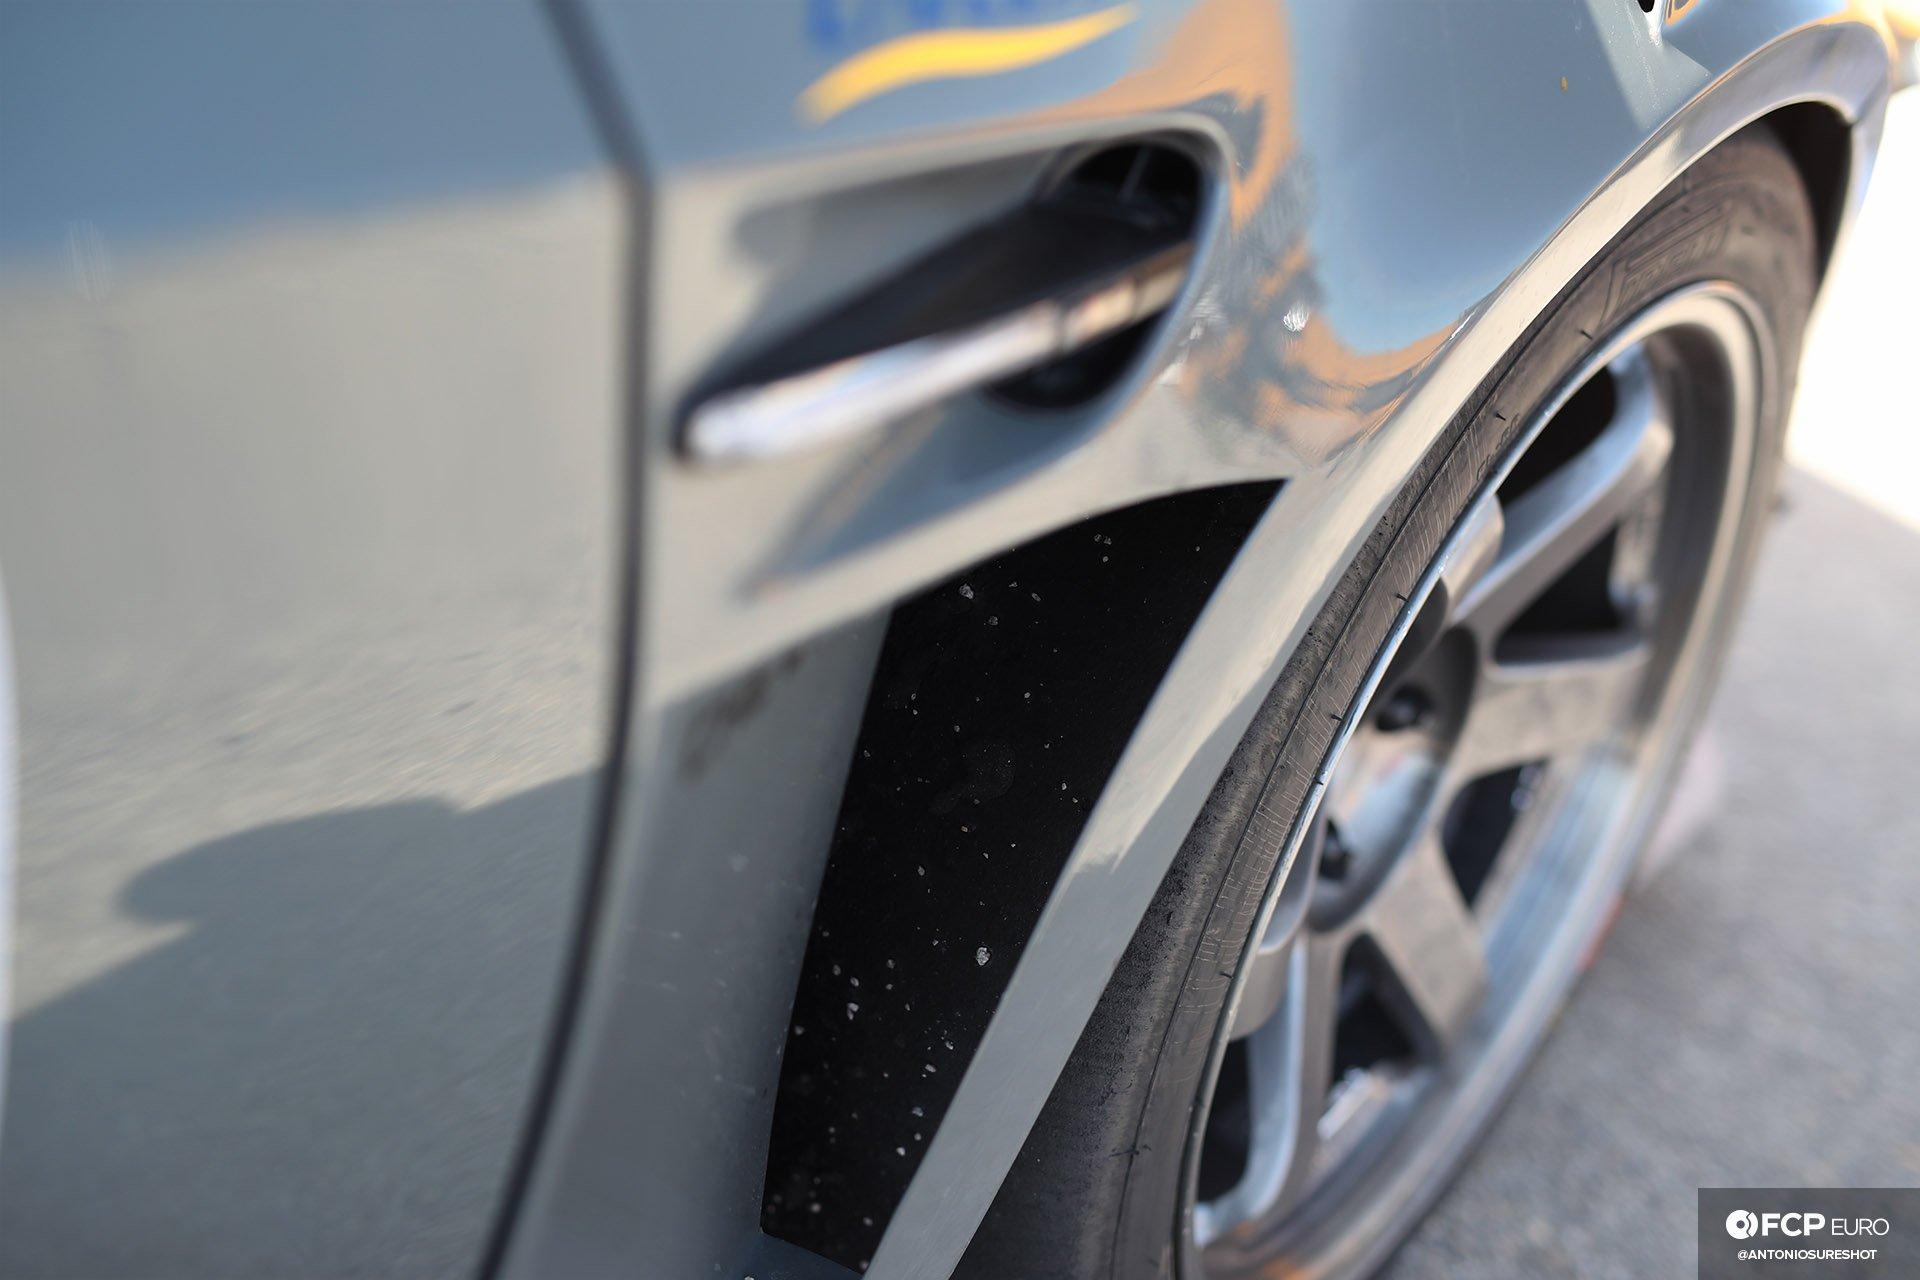 Bimmer Challenge BMW E92 M3 Volk Racing TE37 Wheels and Vented Fenders